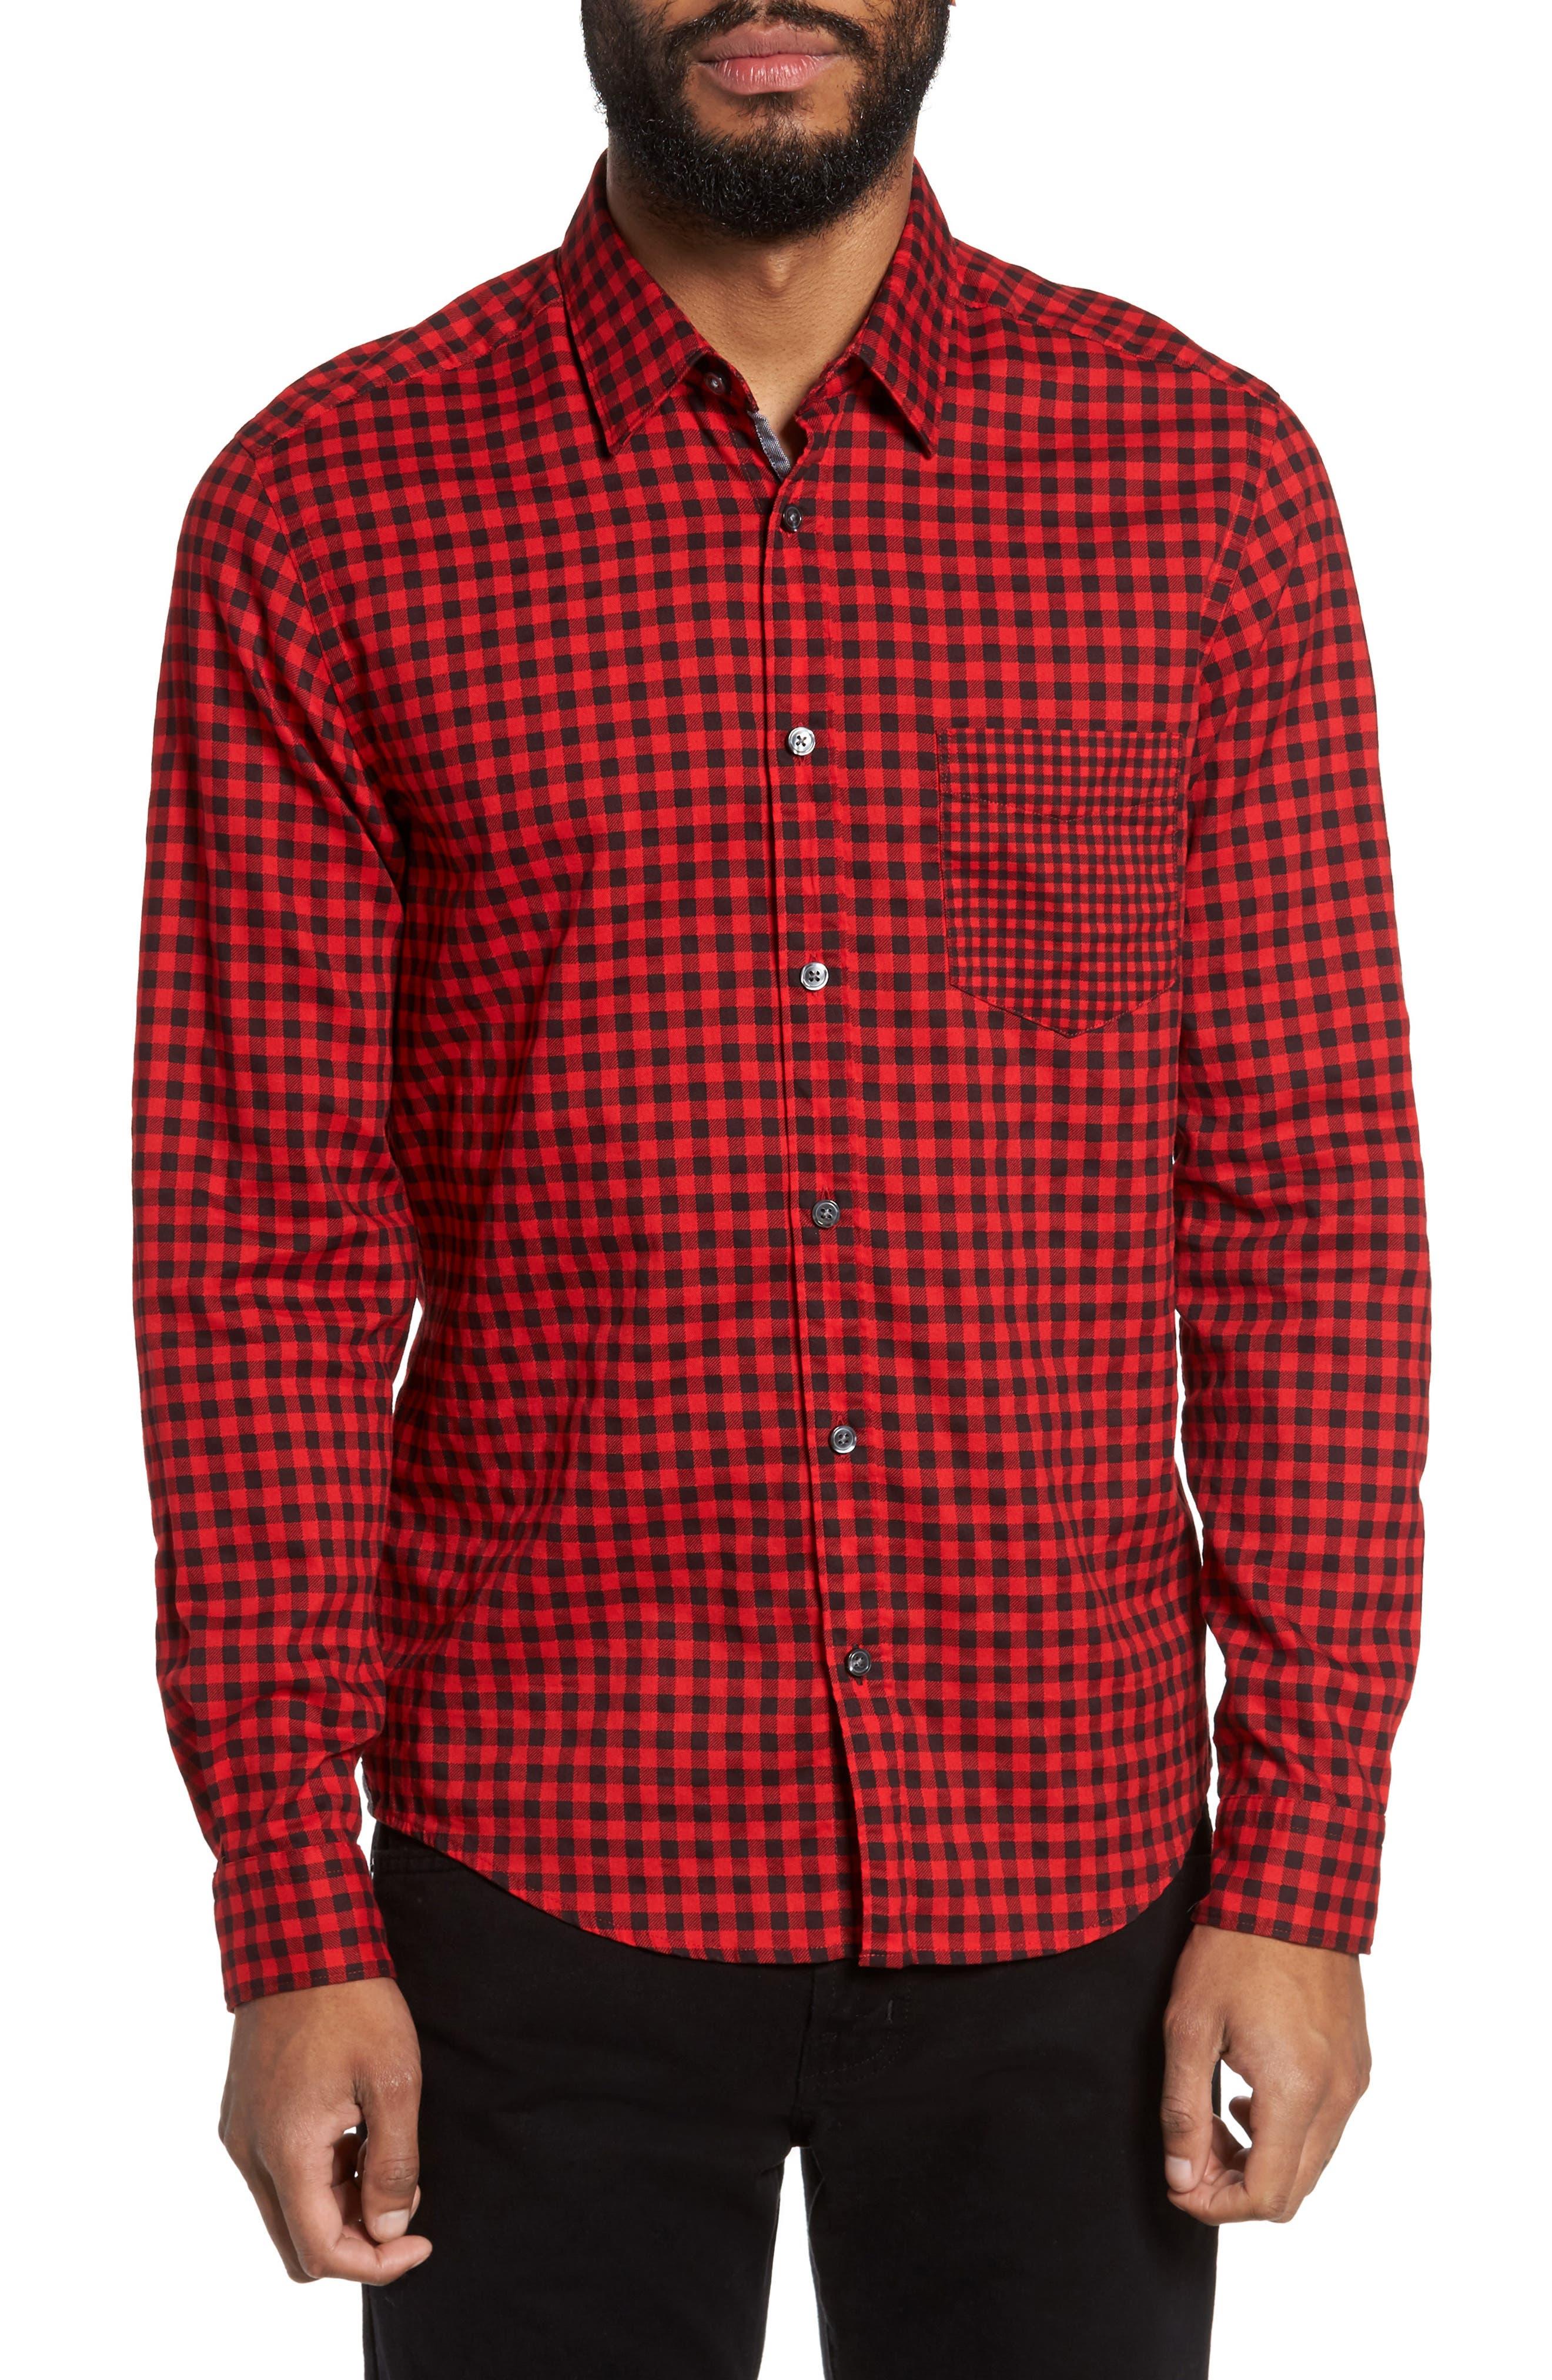 Main Image - BOSS Lance Regular Fit Gingham Check Twill Sport Shirt